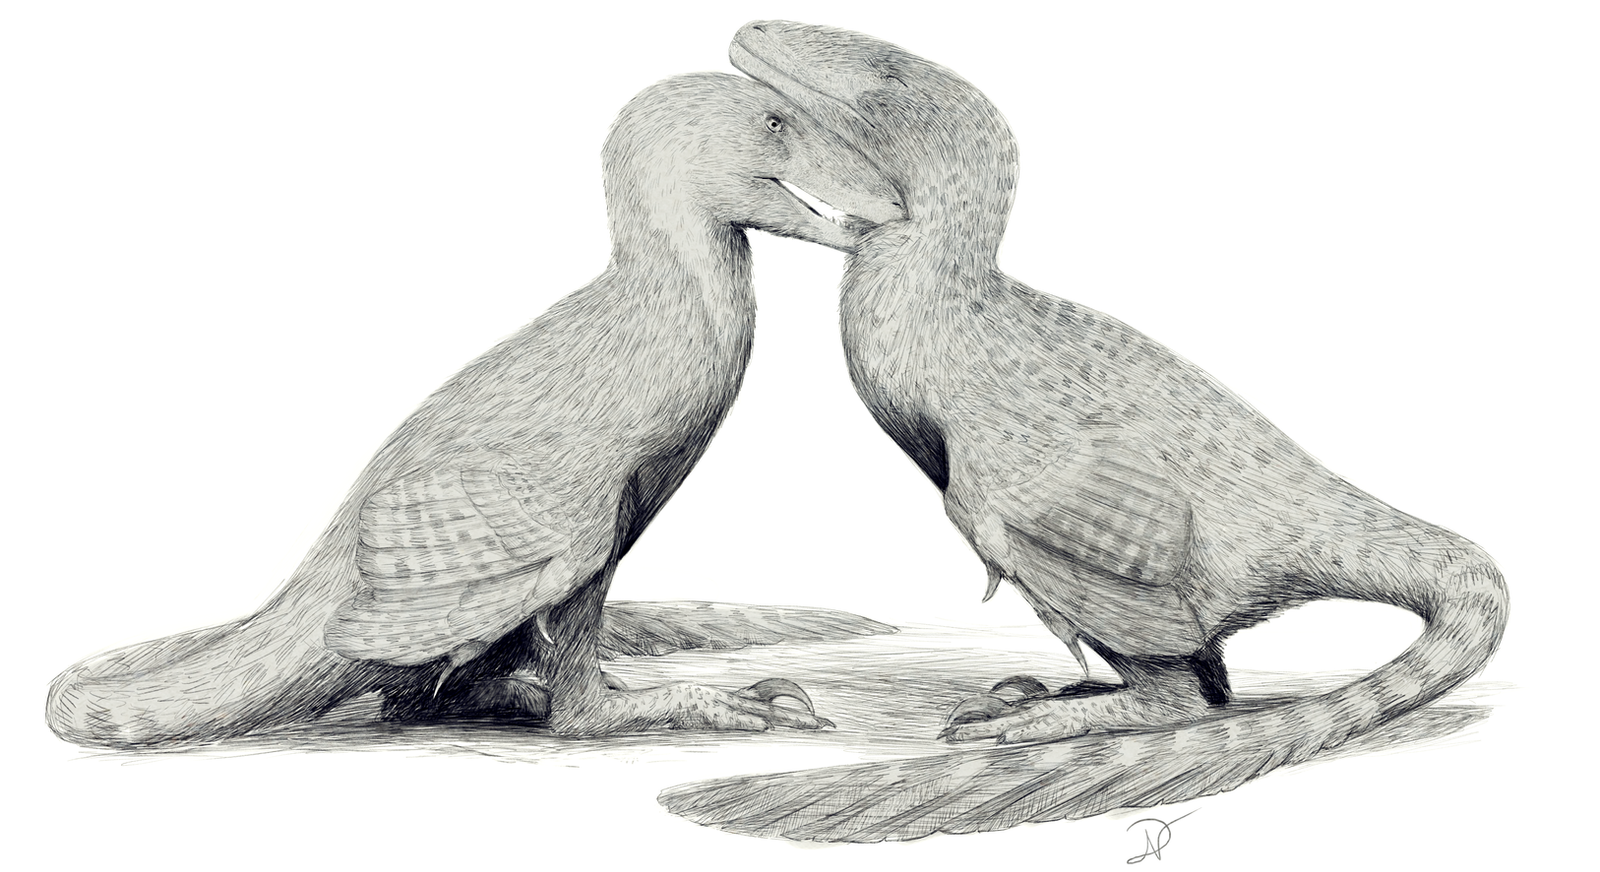 Love doves by DuskyVel